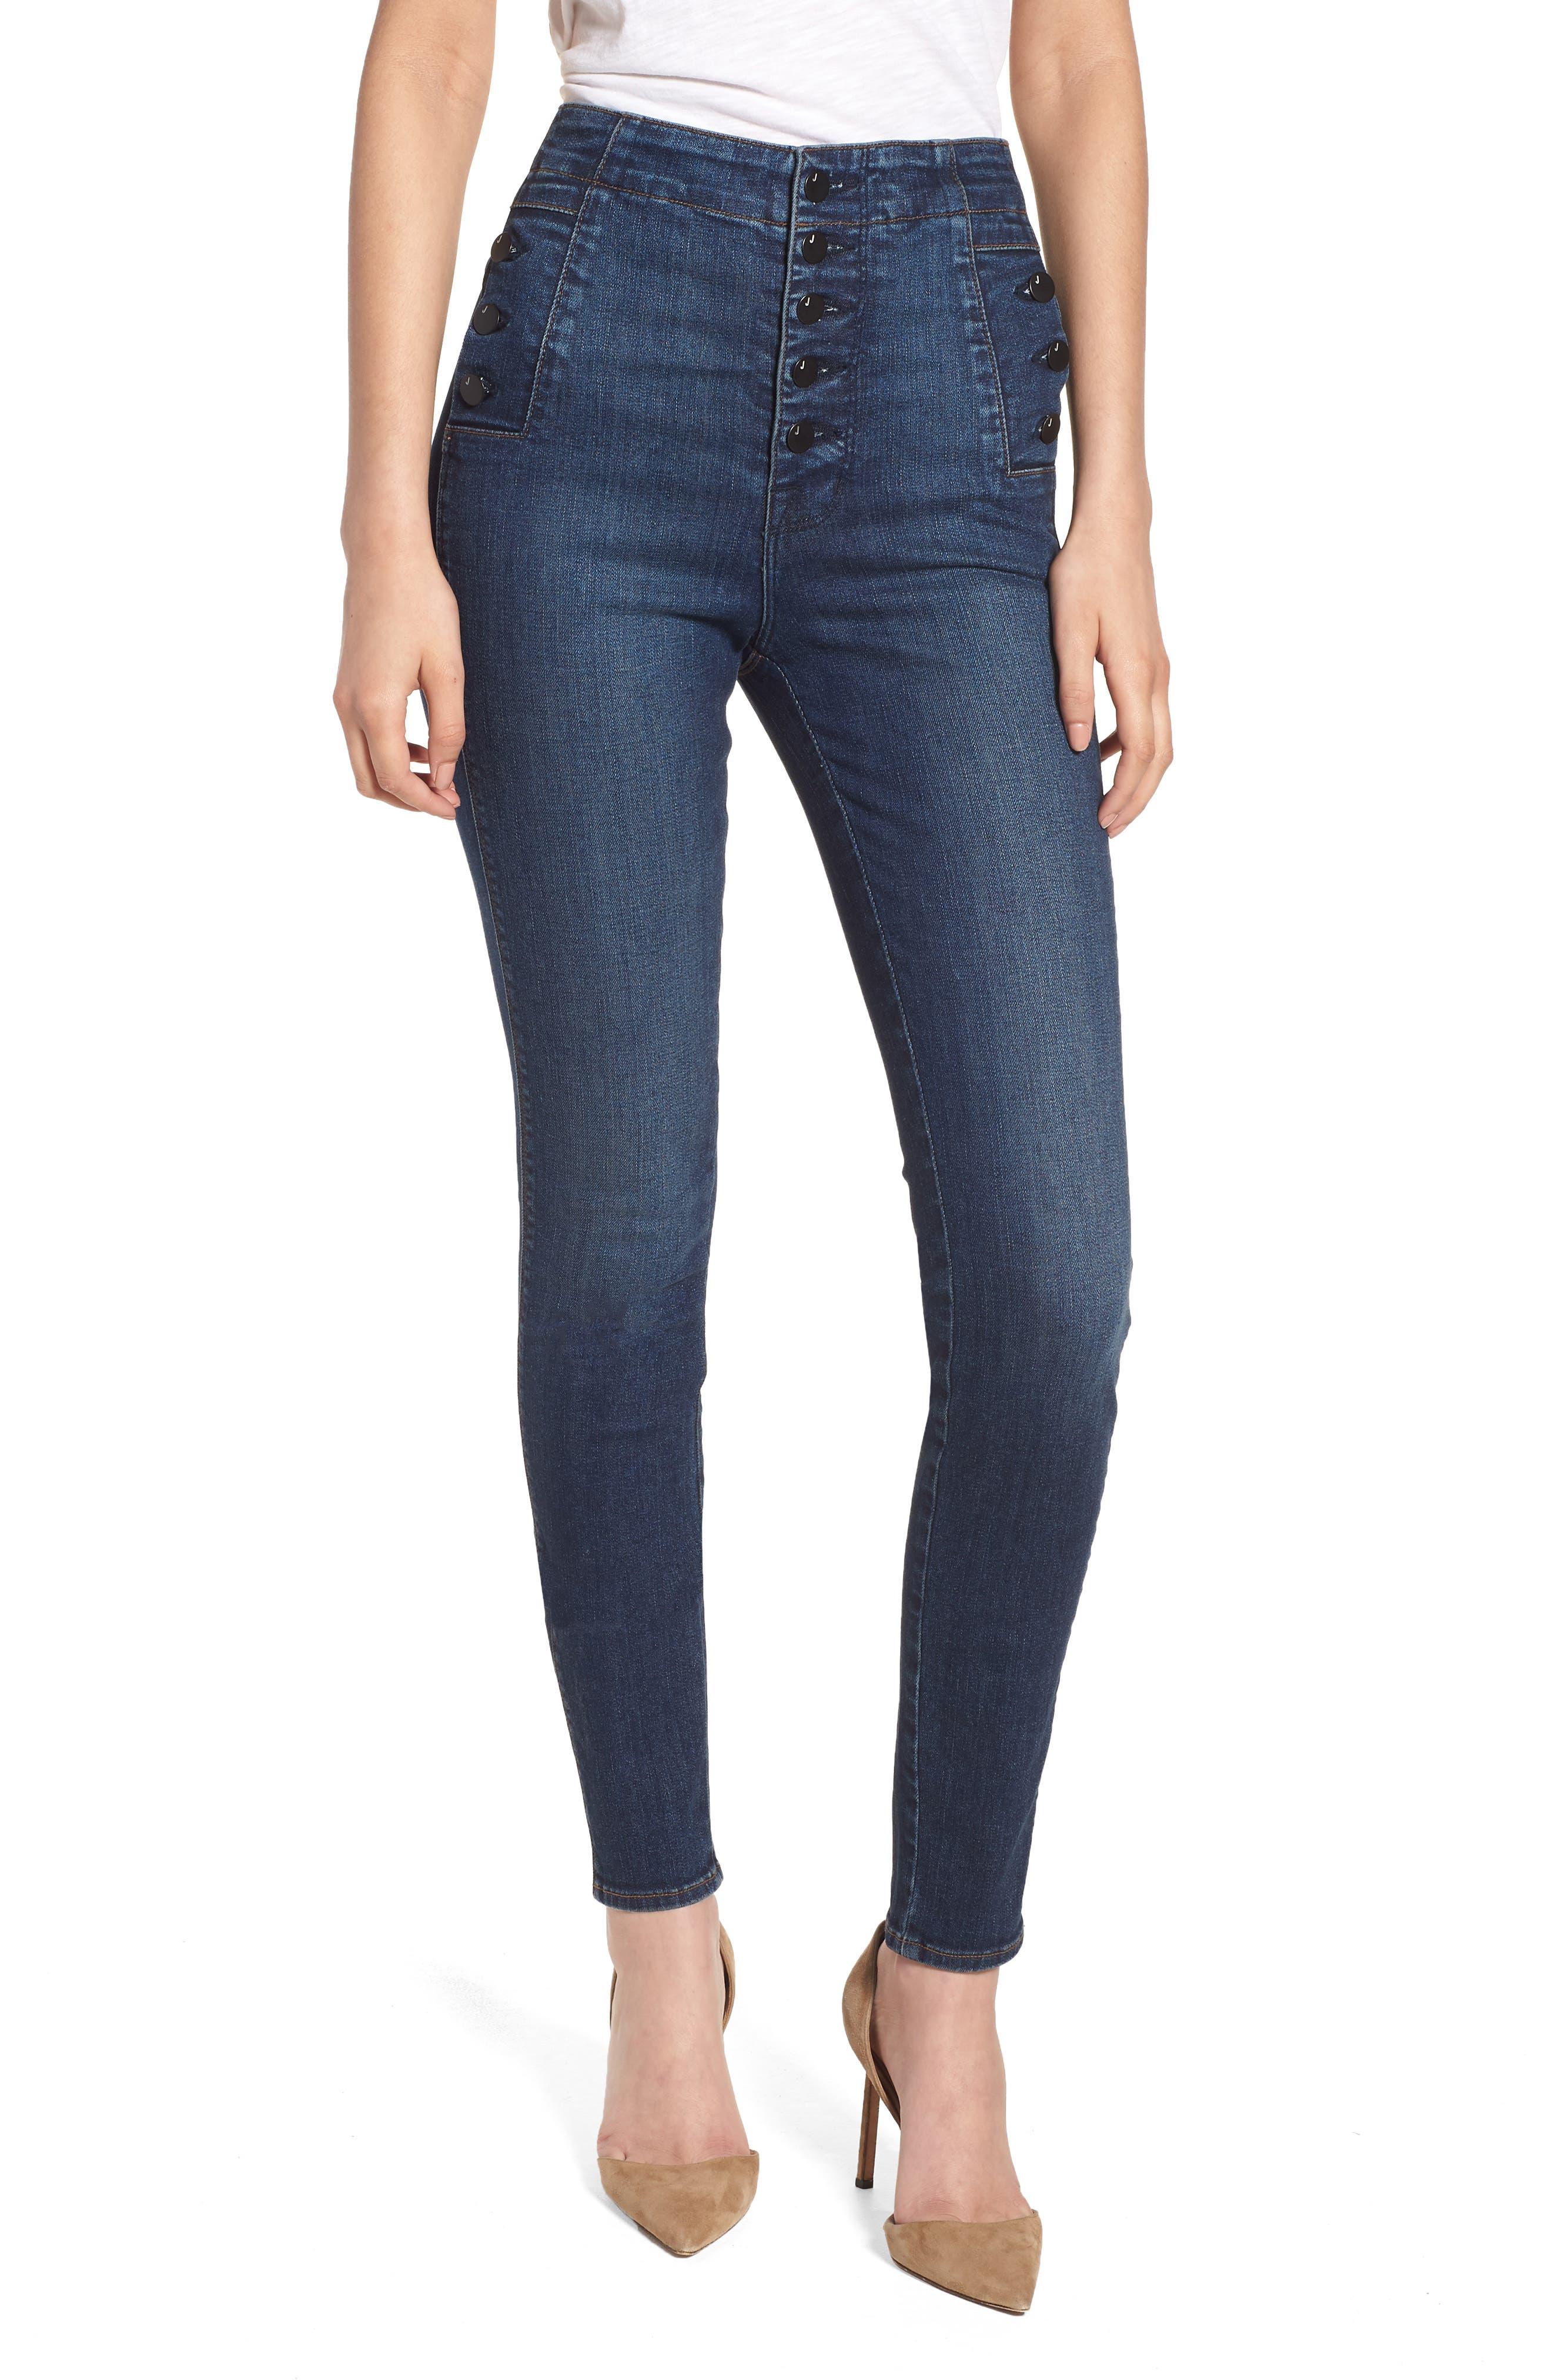 Natasha Sky High High Waist Skinny Jeans,                             Main thumbnail 1, color,                             Revival